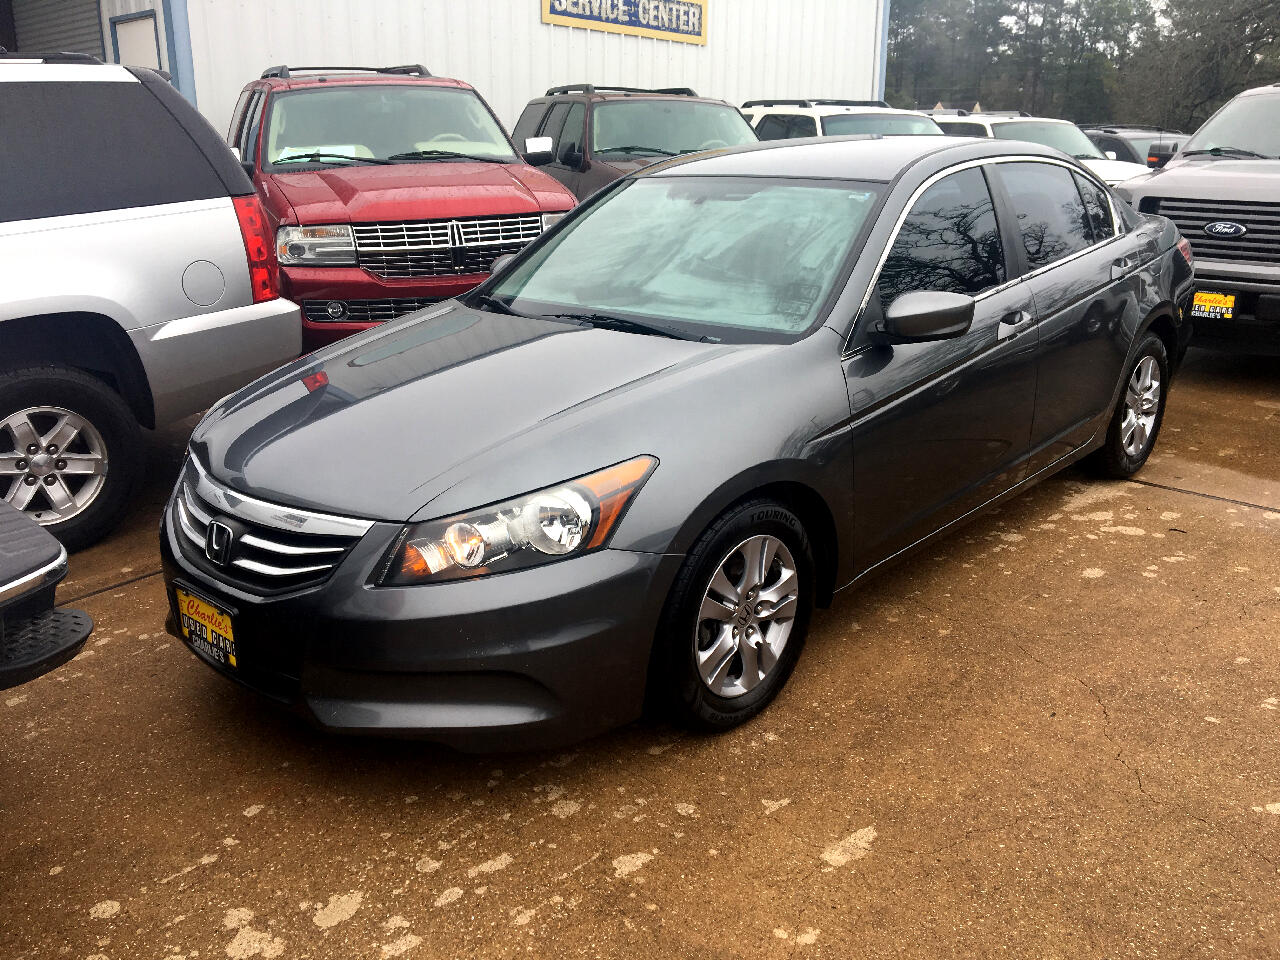 2012 Honda Accord Sdn 4dr I4 Auto LX Premium